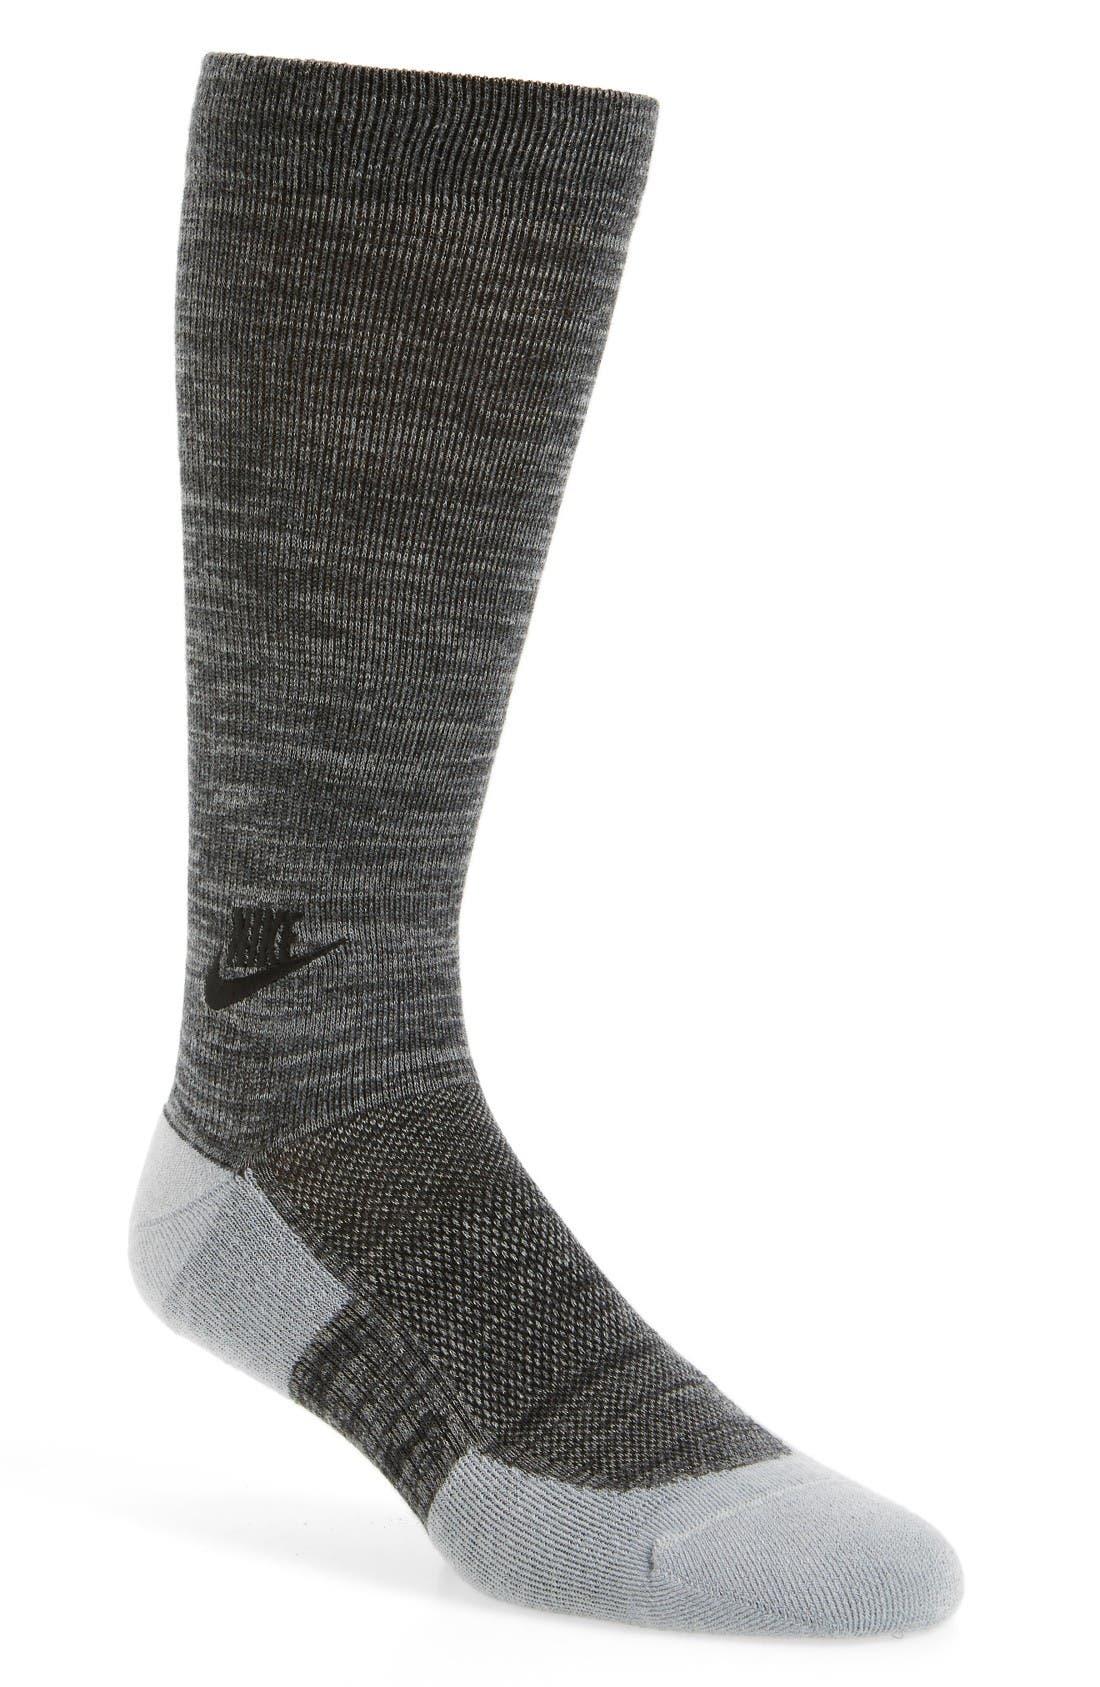 Nike Lightweight Warmth Crew Socks